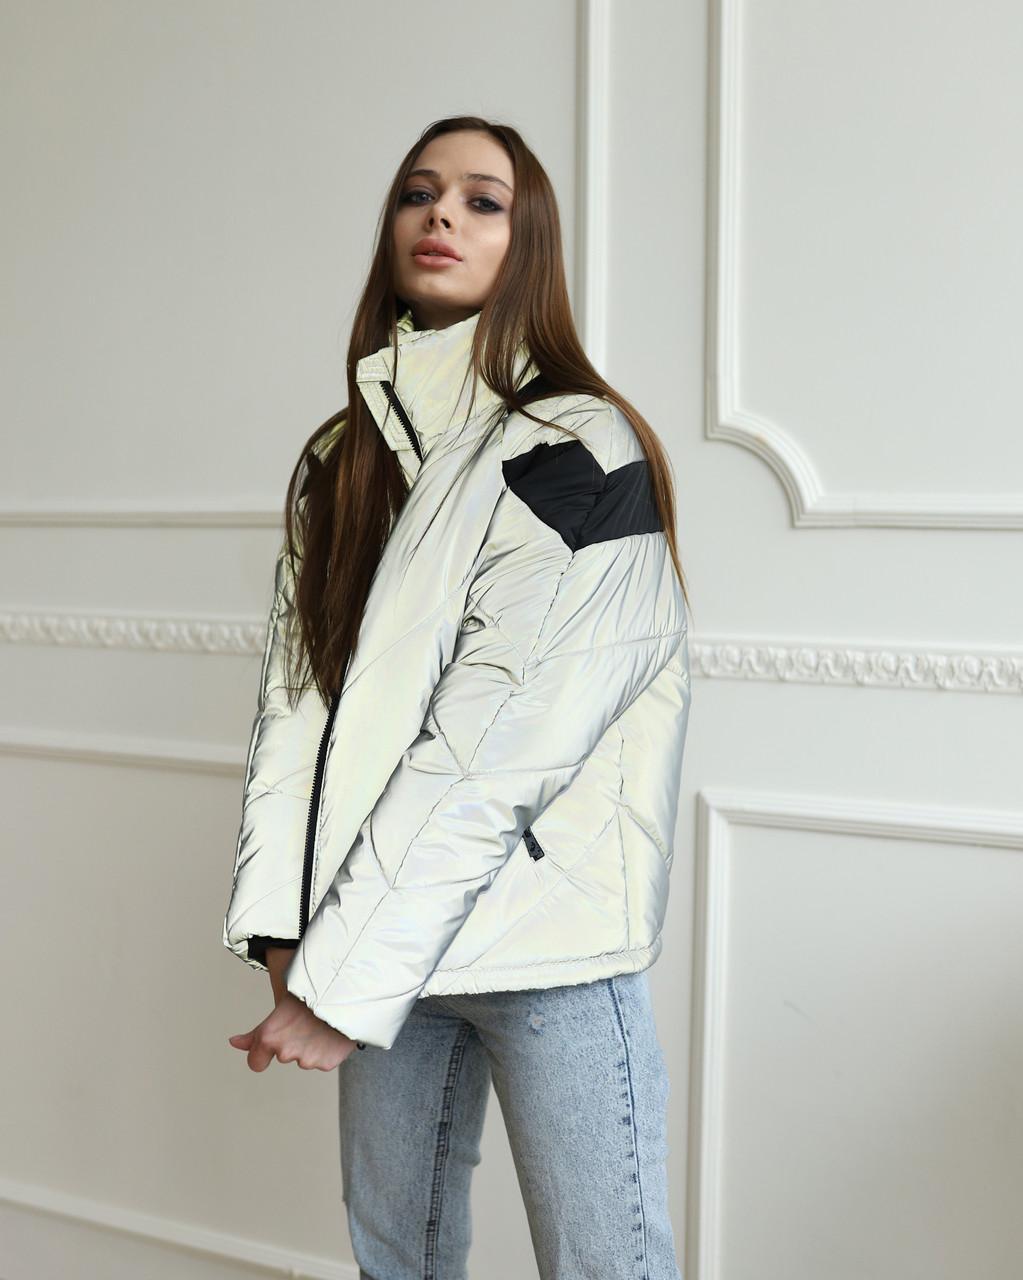 Куртка женская оверсайз рефлективная от бренда ТУР модель Кейт